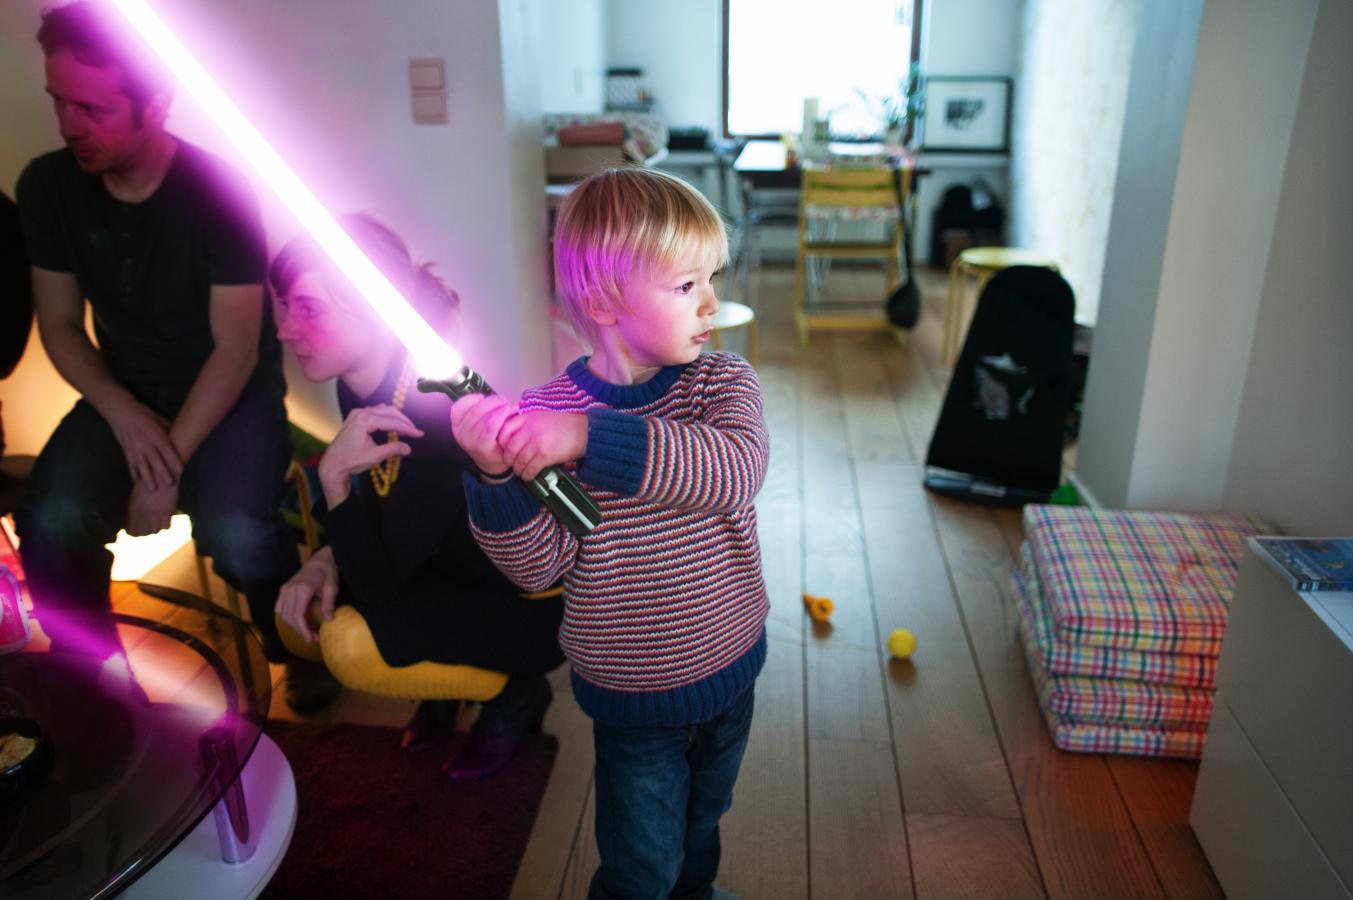 star-wars-game-on-playstation-antwerpen-2012